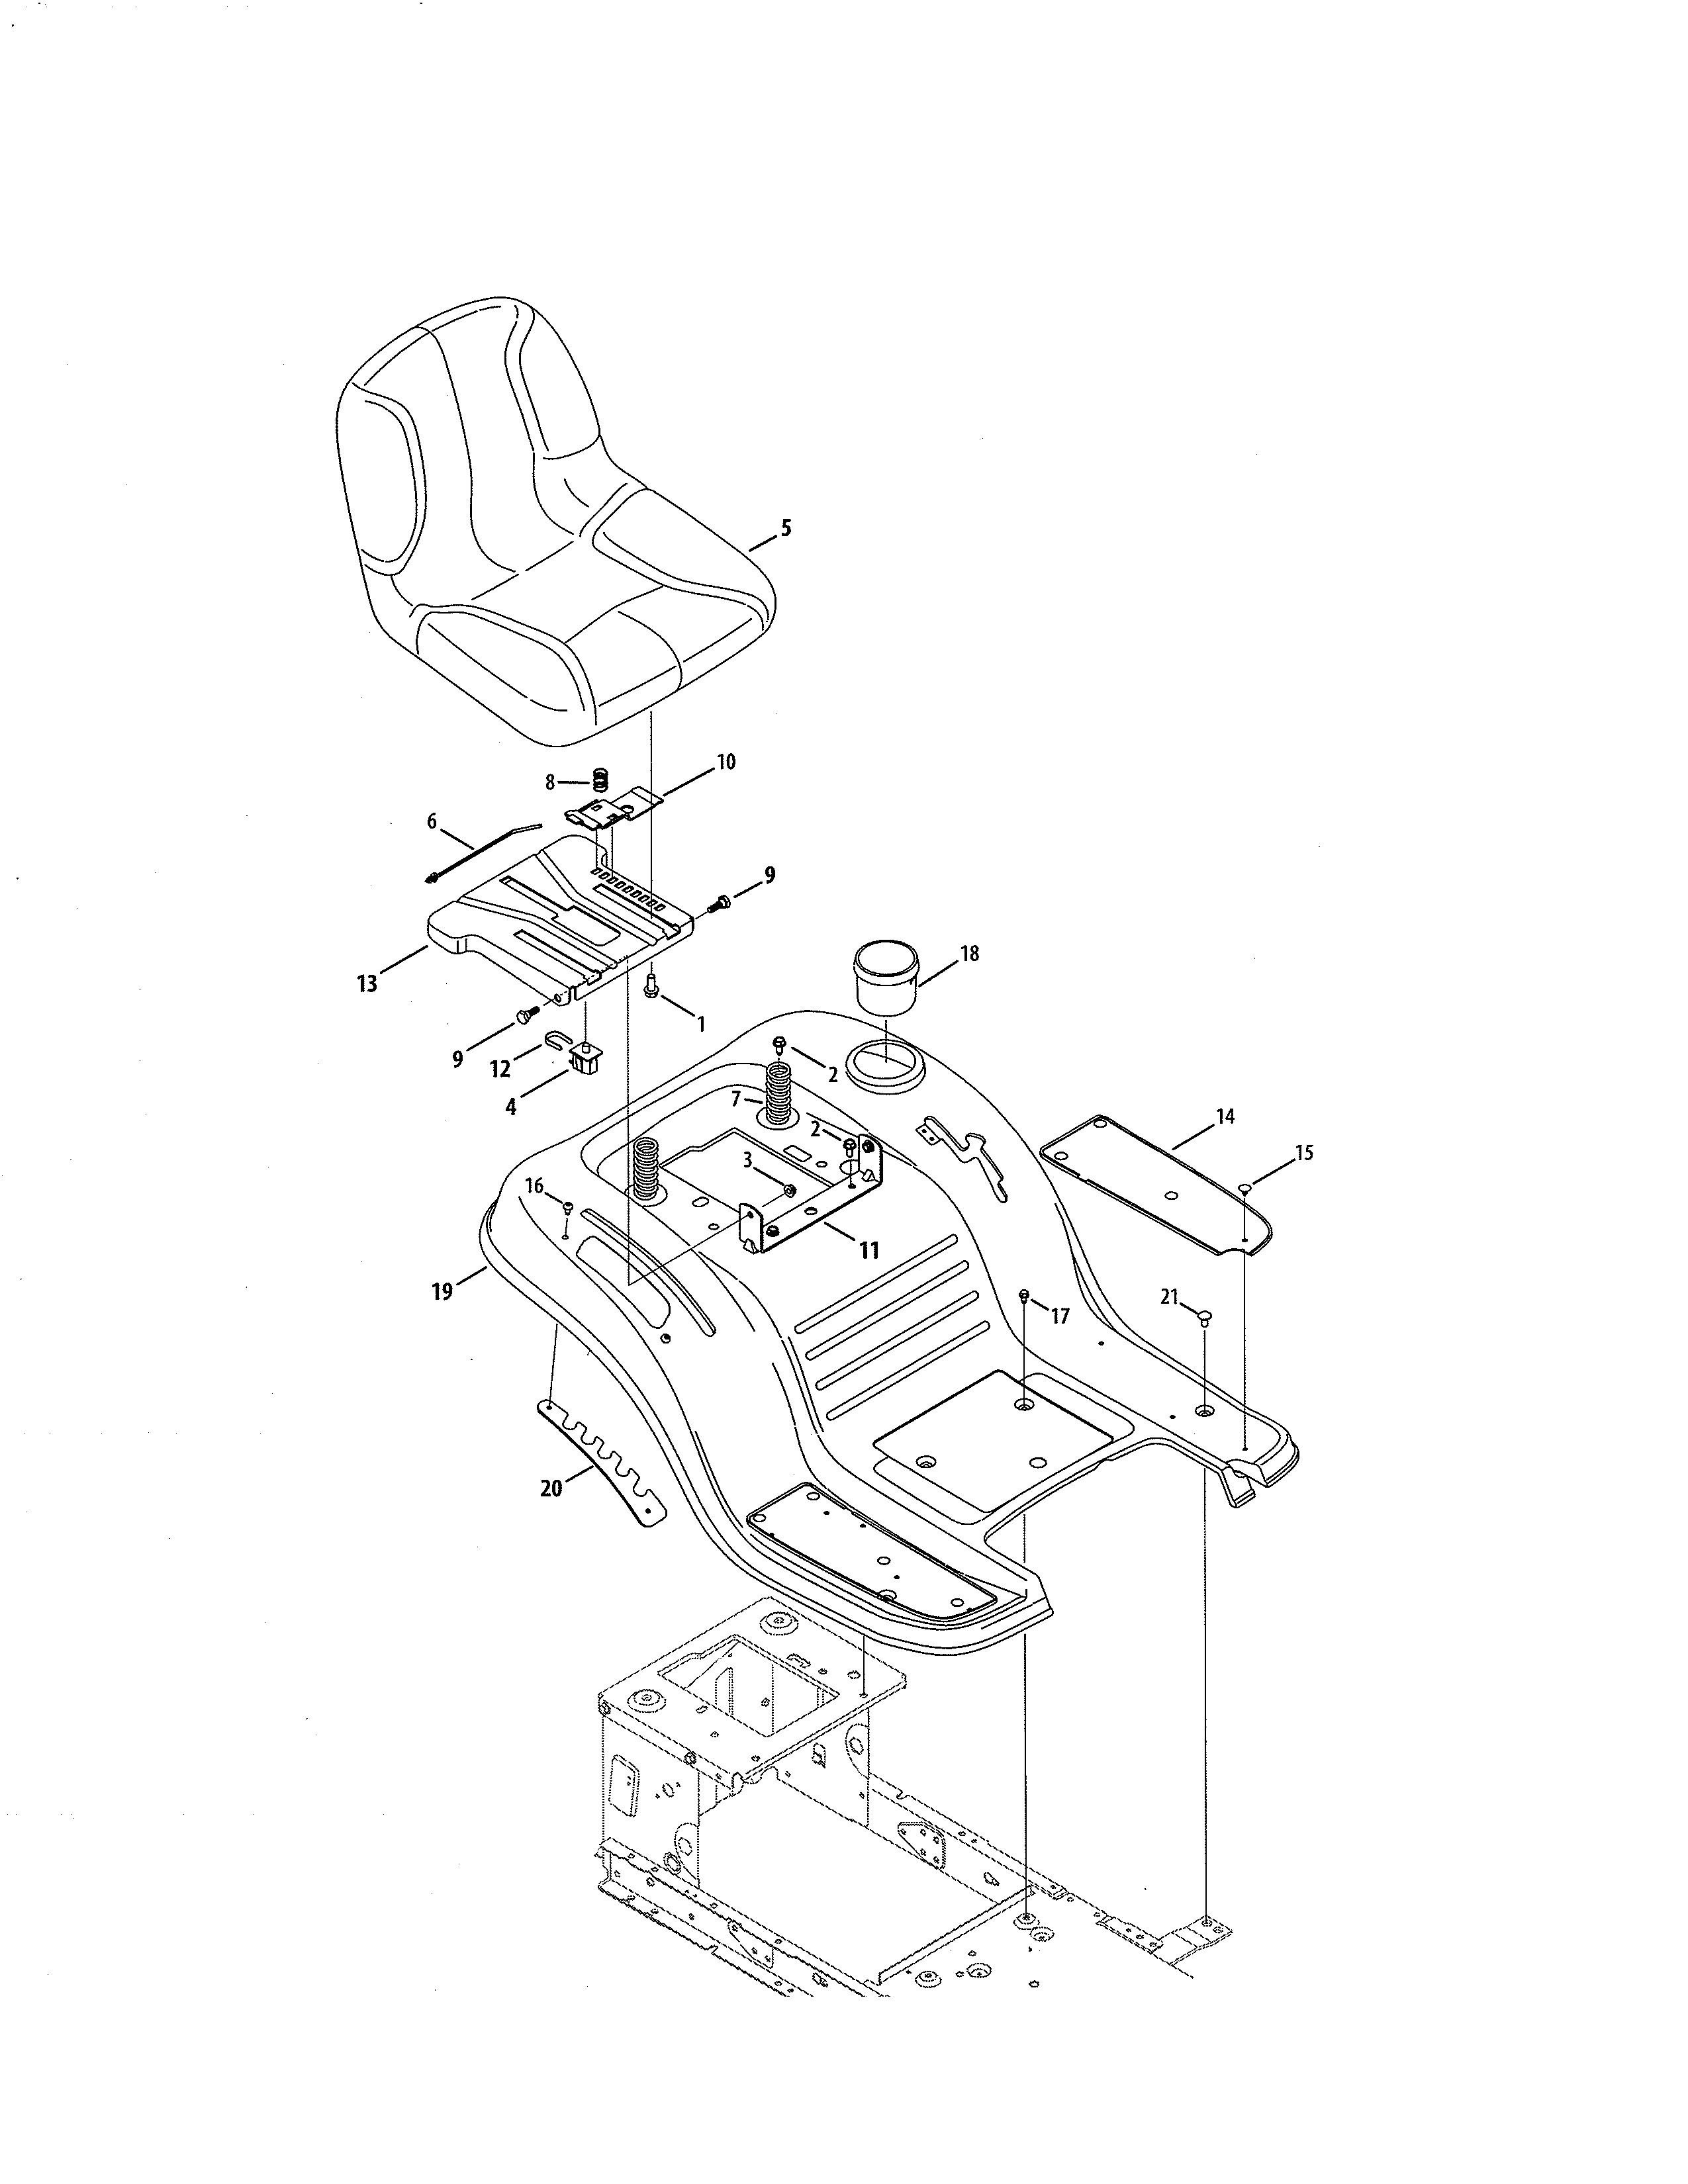 Craftsman Model 247289150 Lawn Tractor Genuine Parts 22 Hp Kohler Charging Wiring Diagram Schematic Seat Fender